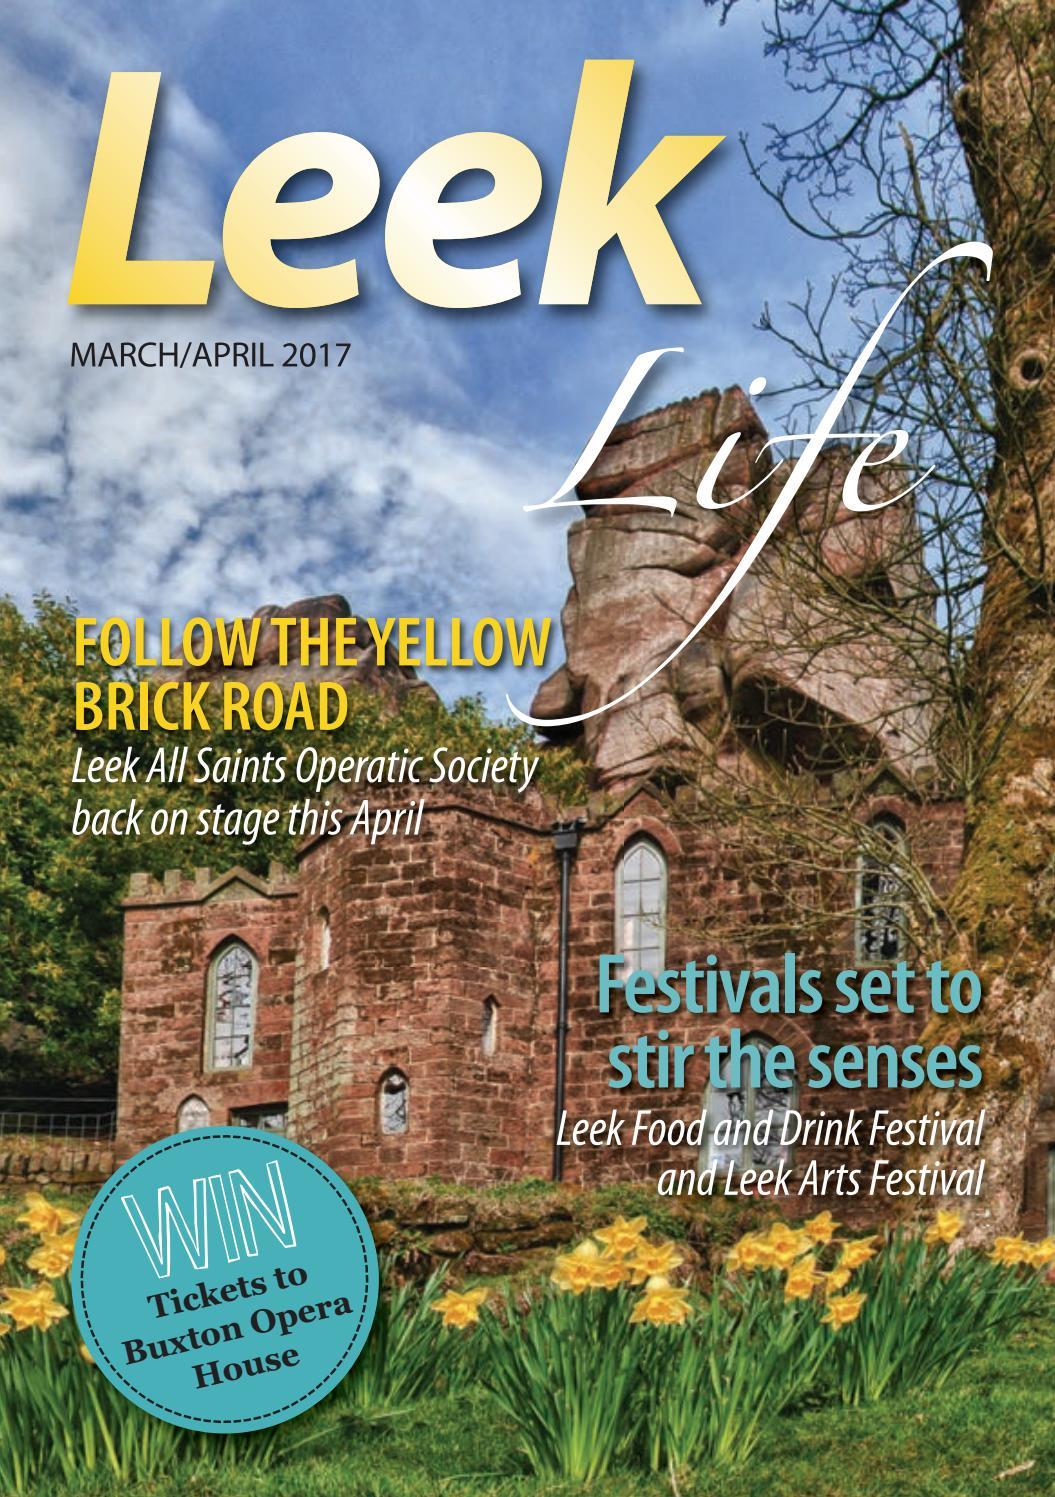 Leek Life Mar Apr 2017 by Times Echo and Life - issuu